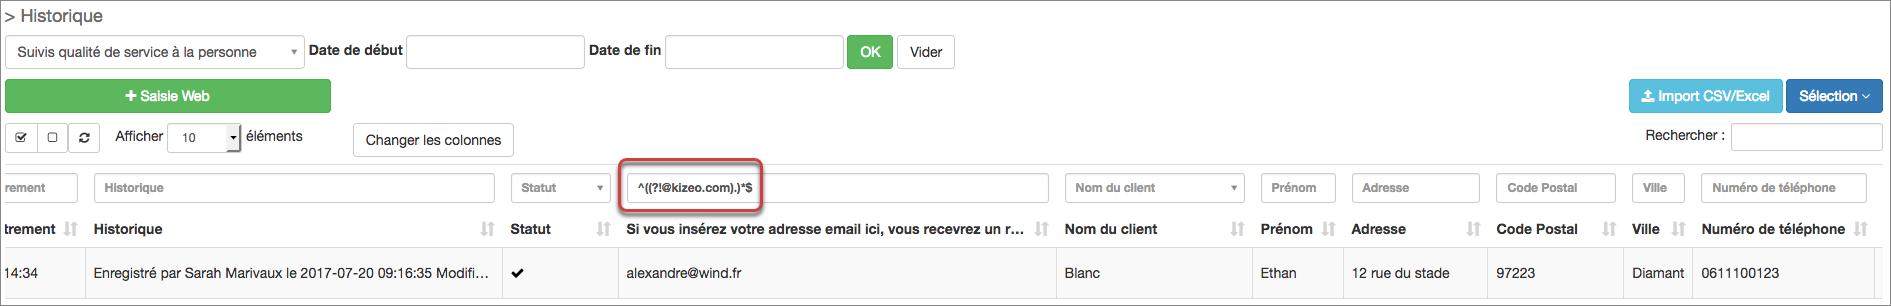 ^((?!@kizeo.com).)*$ permet de rechercher ne contient pas @kizeo.com